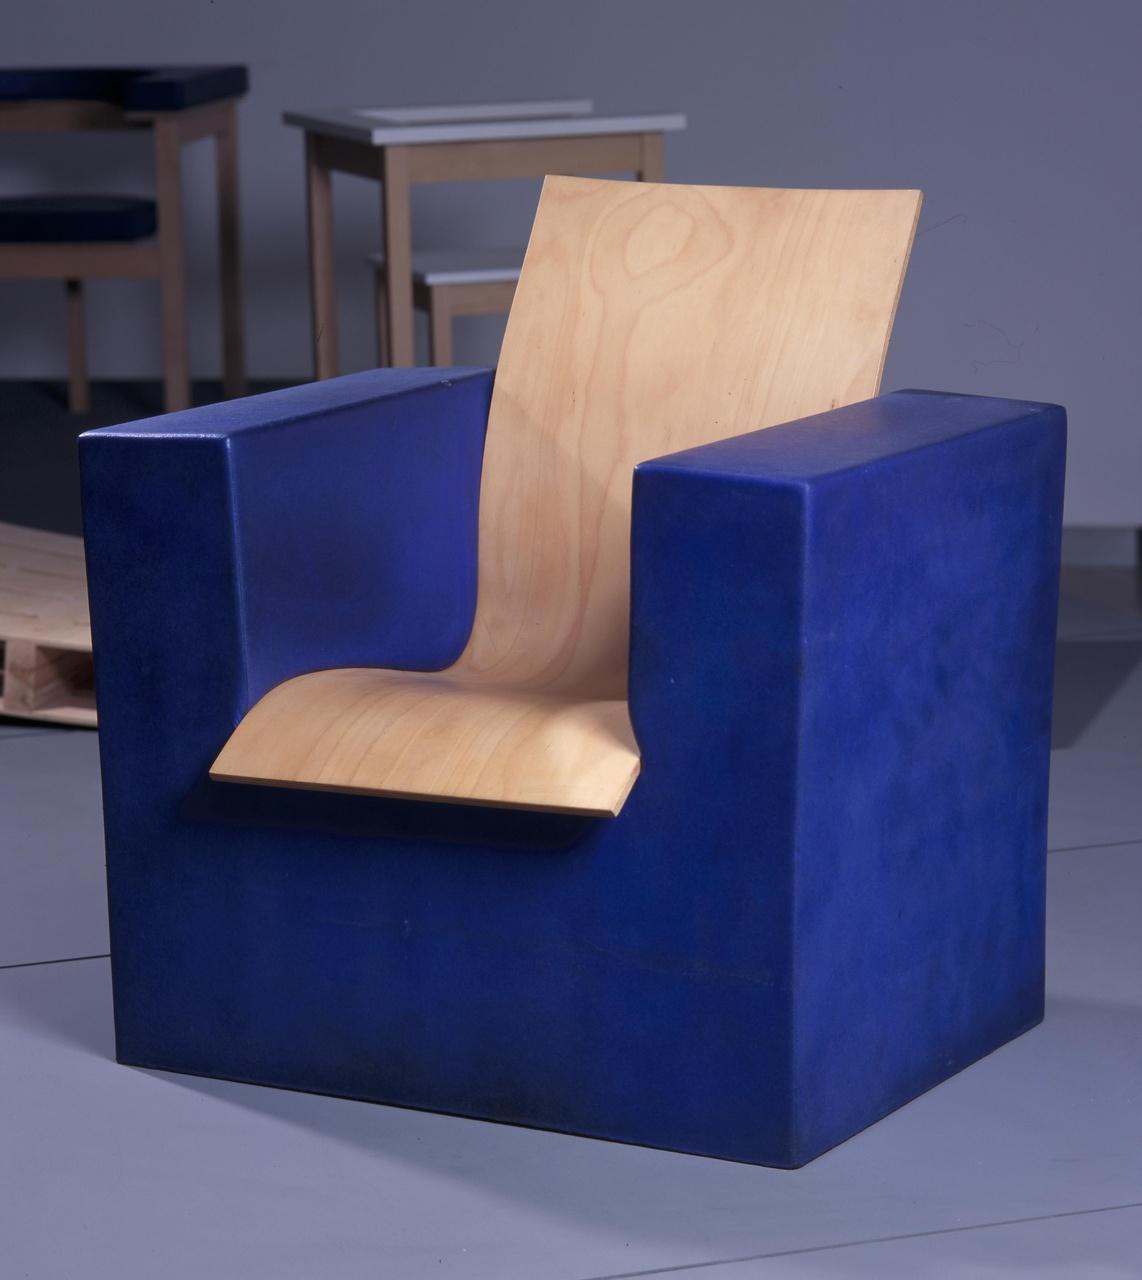 Leunstoel/Easy chair